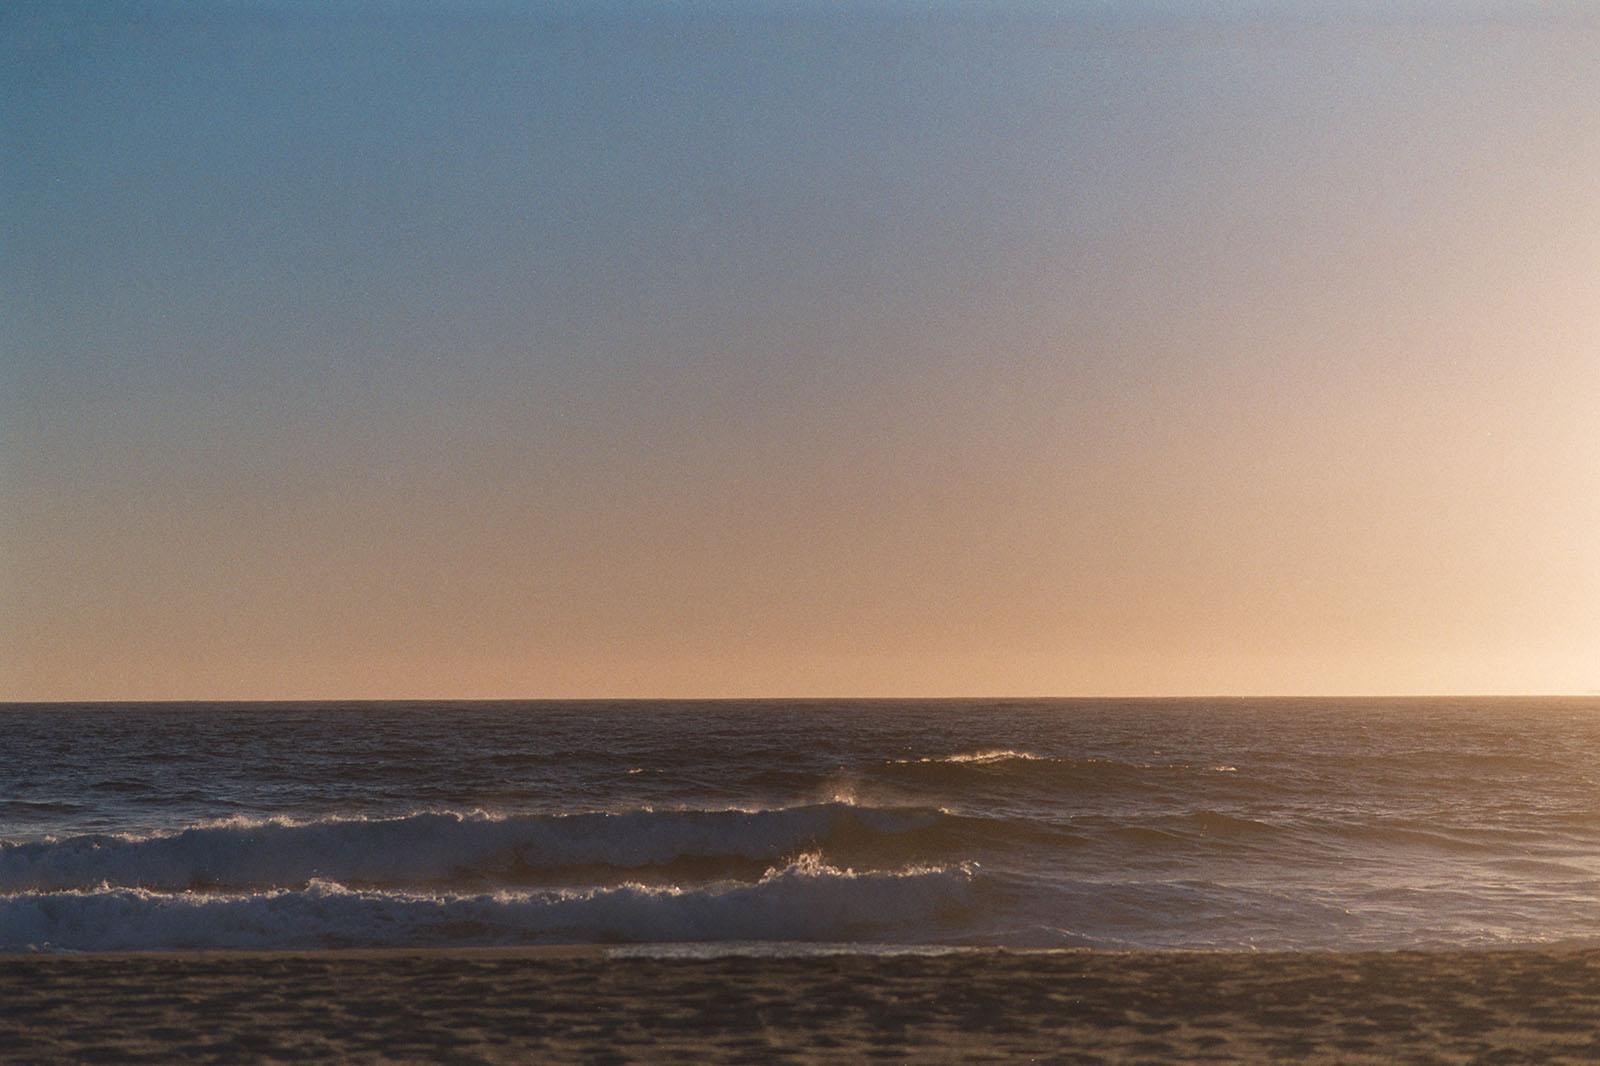 Pakon Scanner Budgewoi beach at sunrise on film